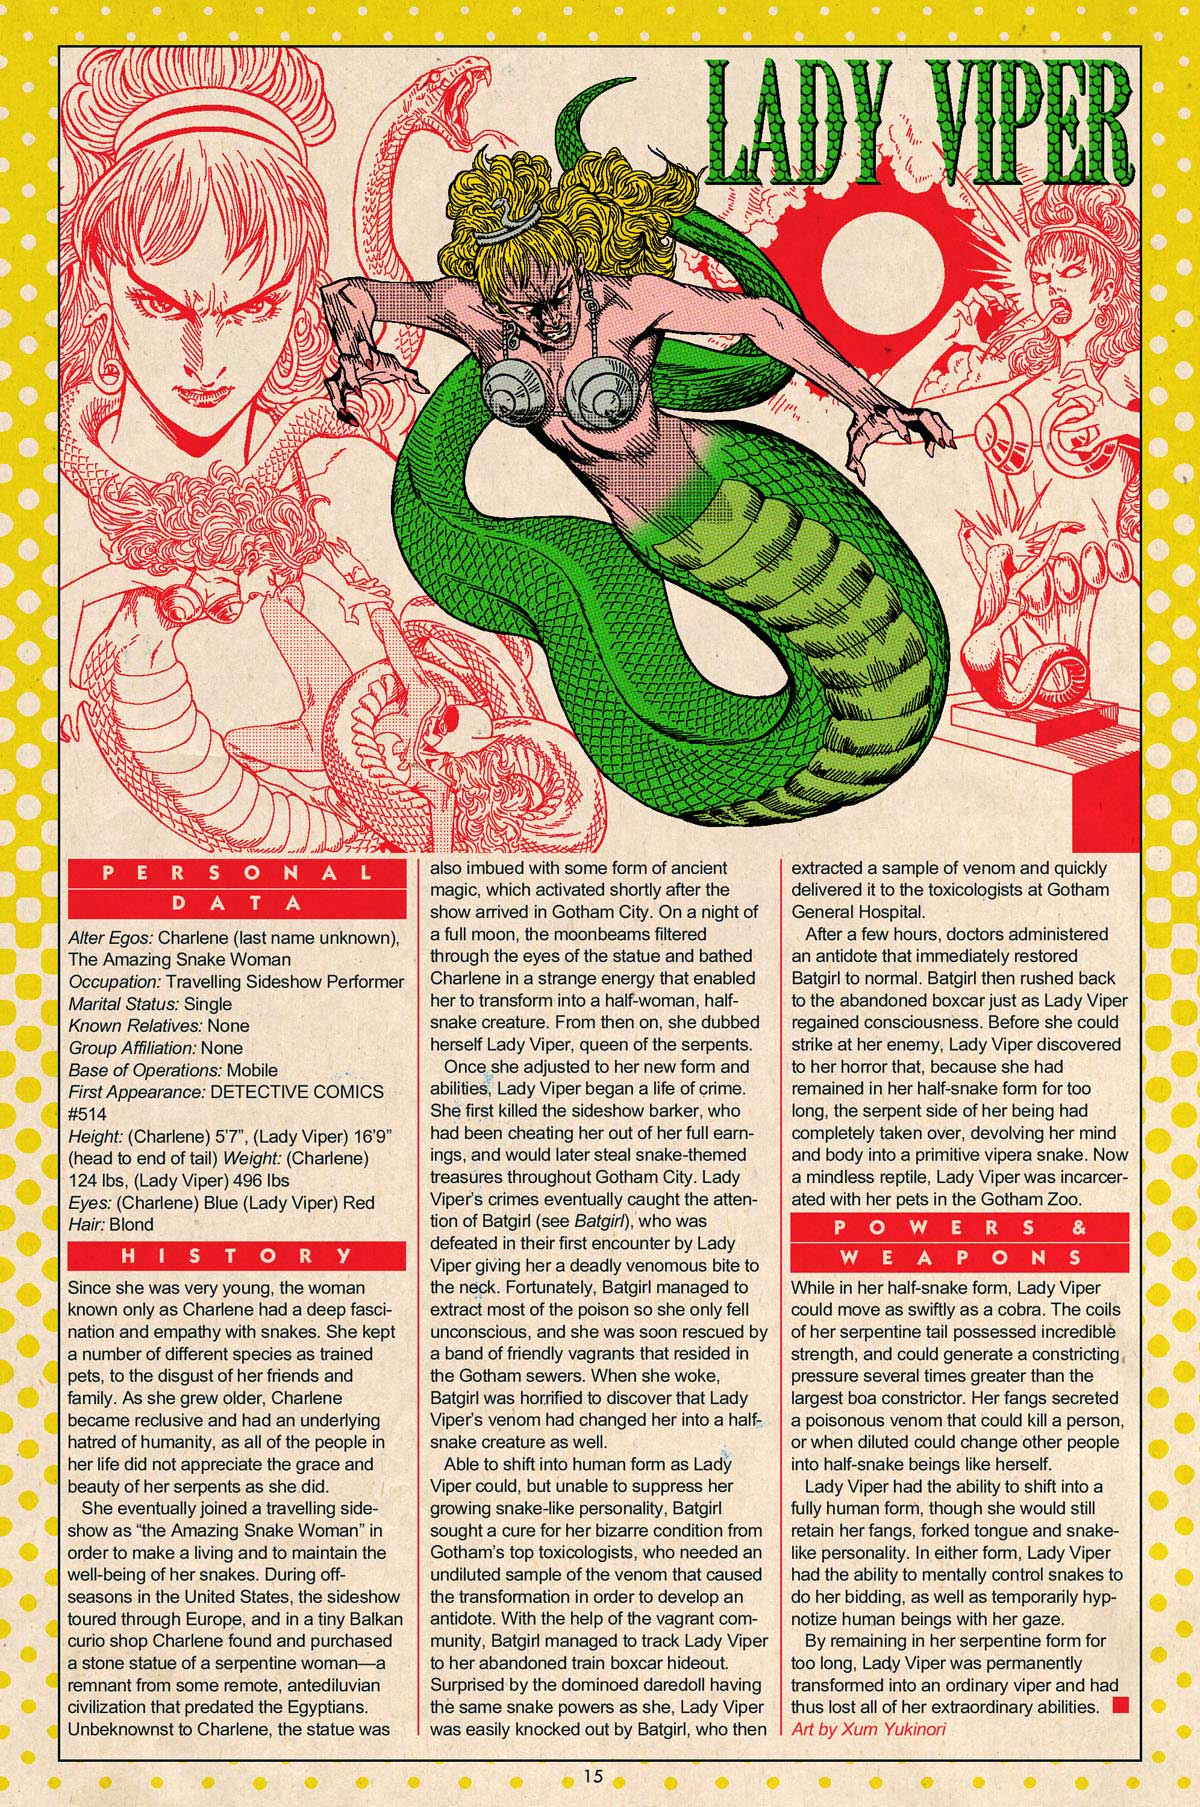 Lady Viper Who's Who by Xum Yukinori